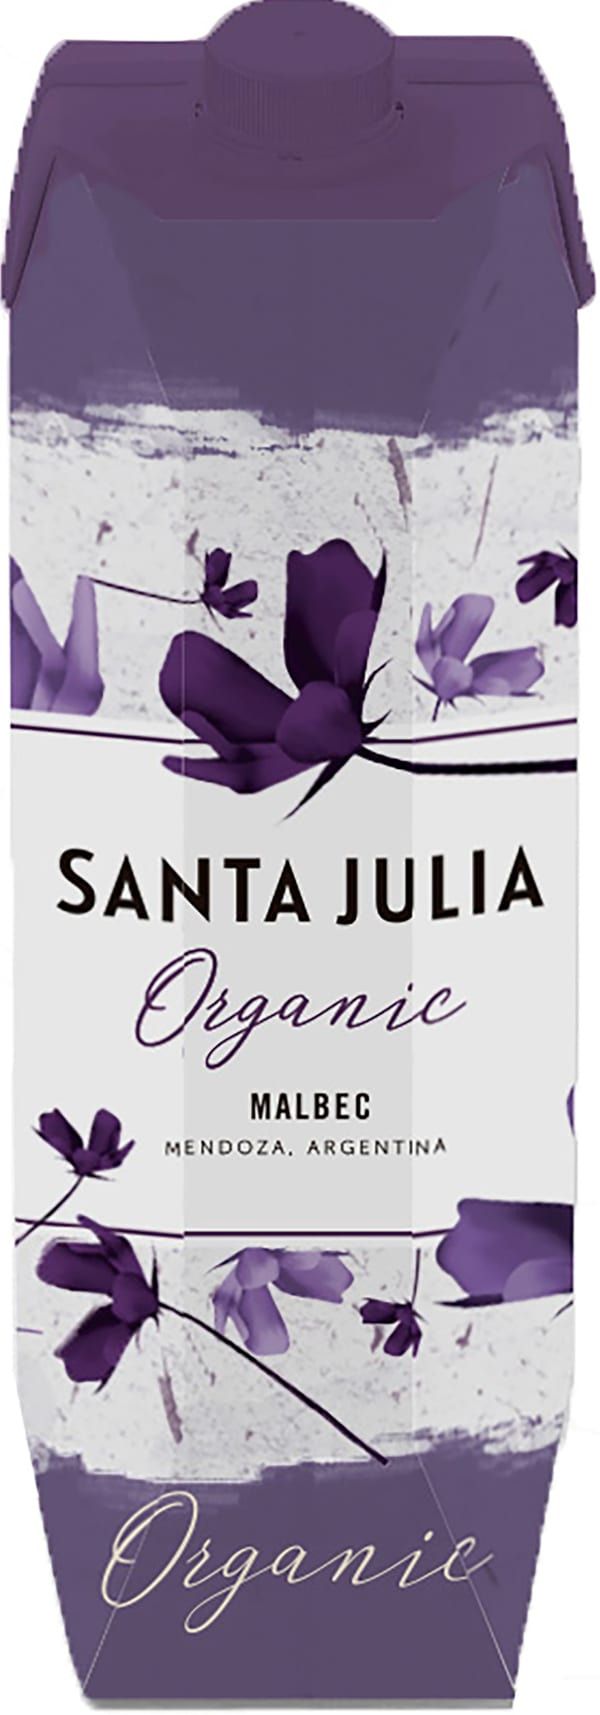 Santa Julia Organic Malbec 2020 carton package